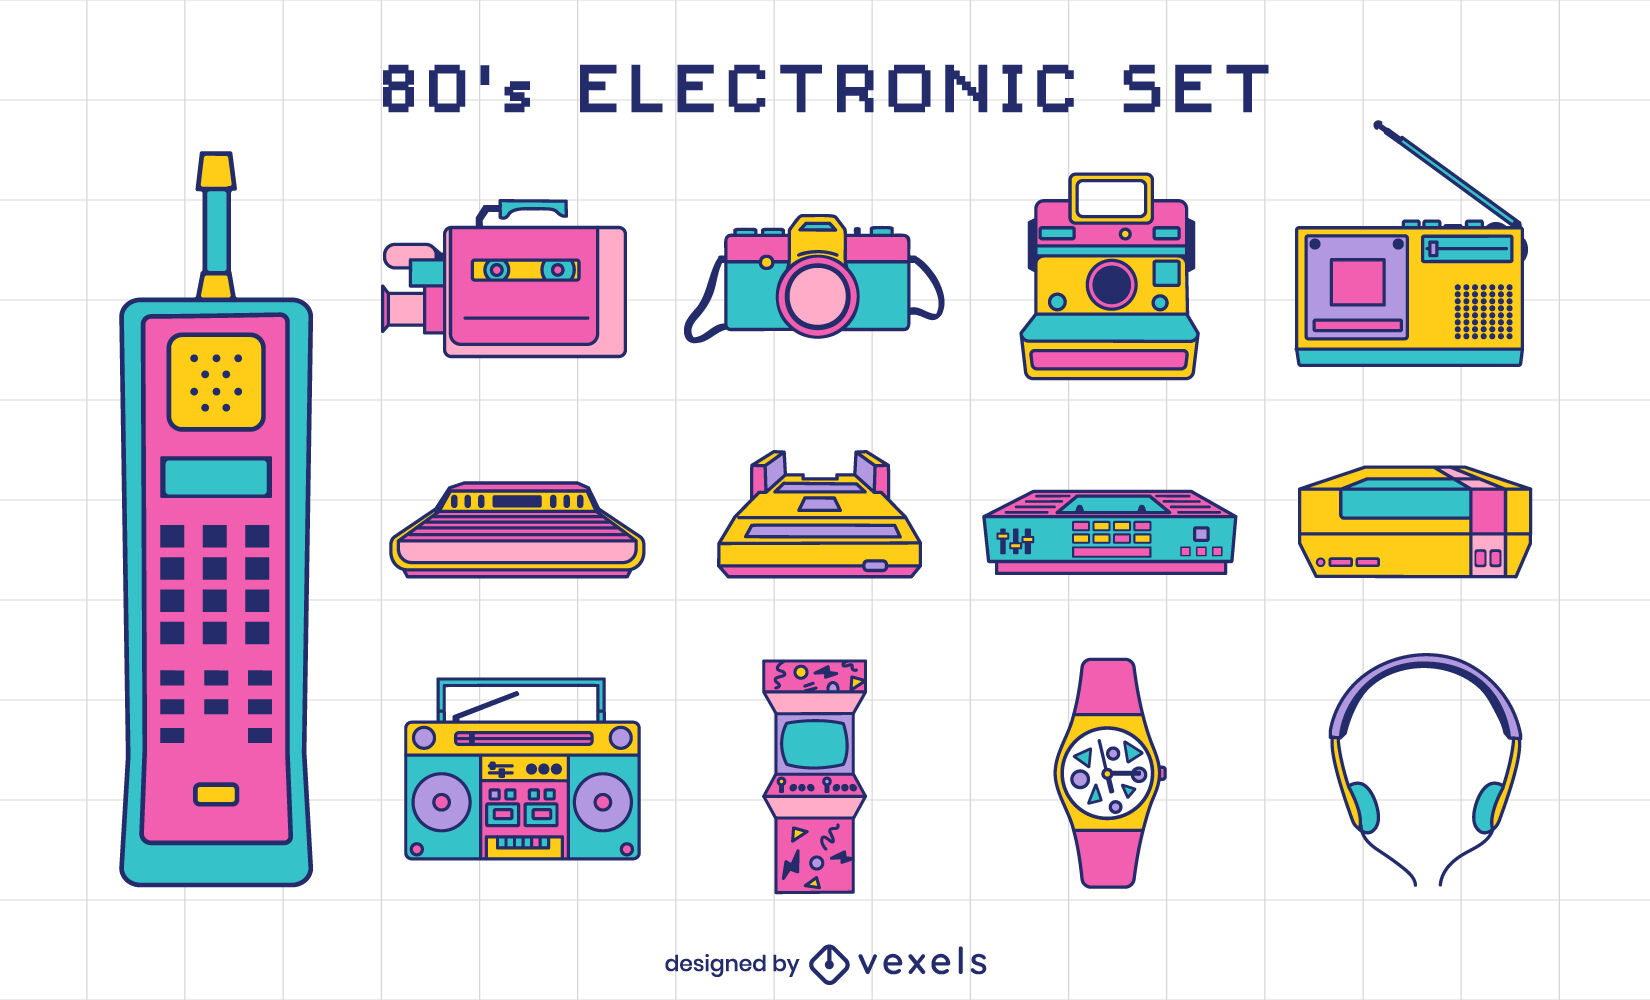 Conjunto de elementos retro de dispositivos eletrônicos dos anos 80